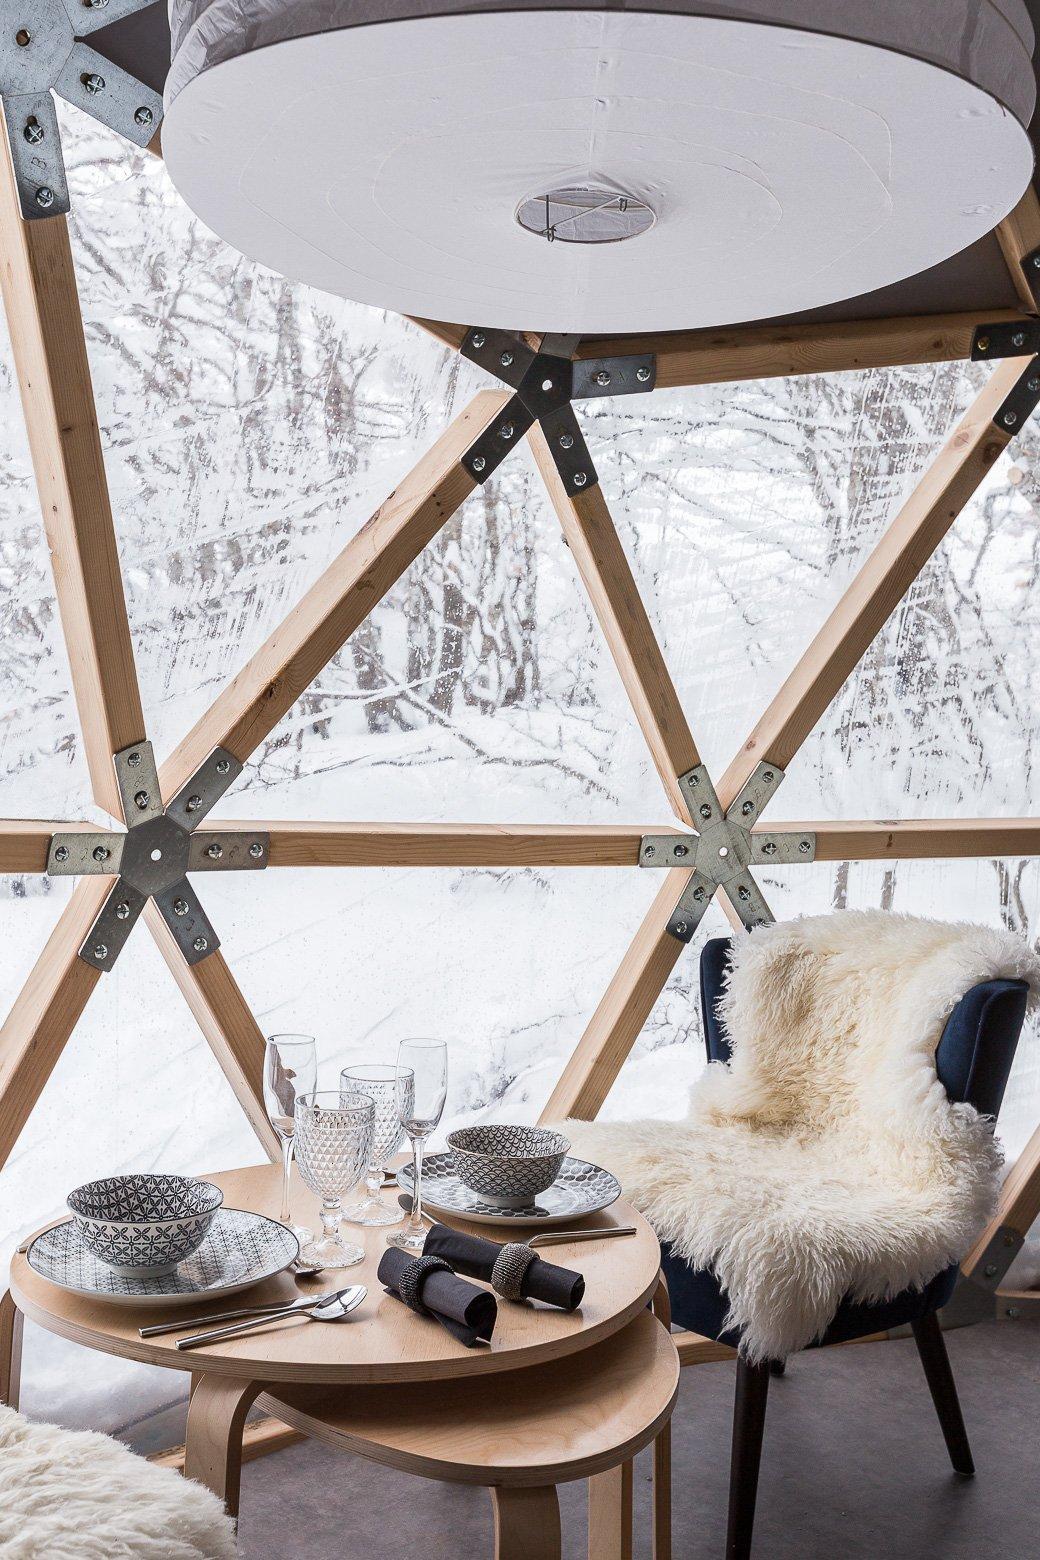 Wild Dome Aventure Nordique Gourette